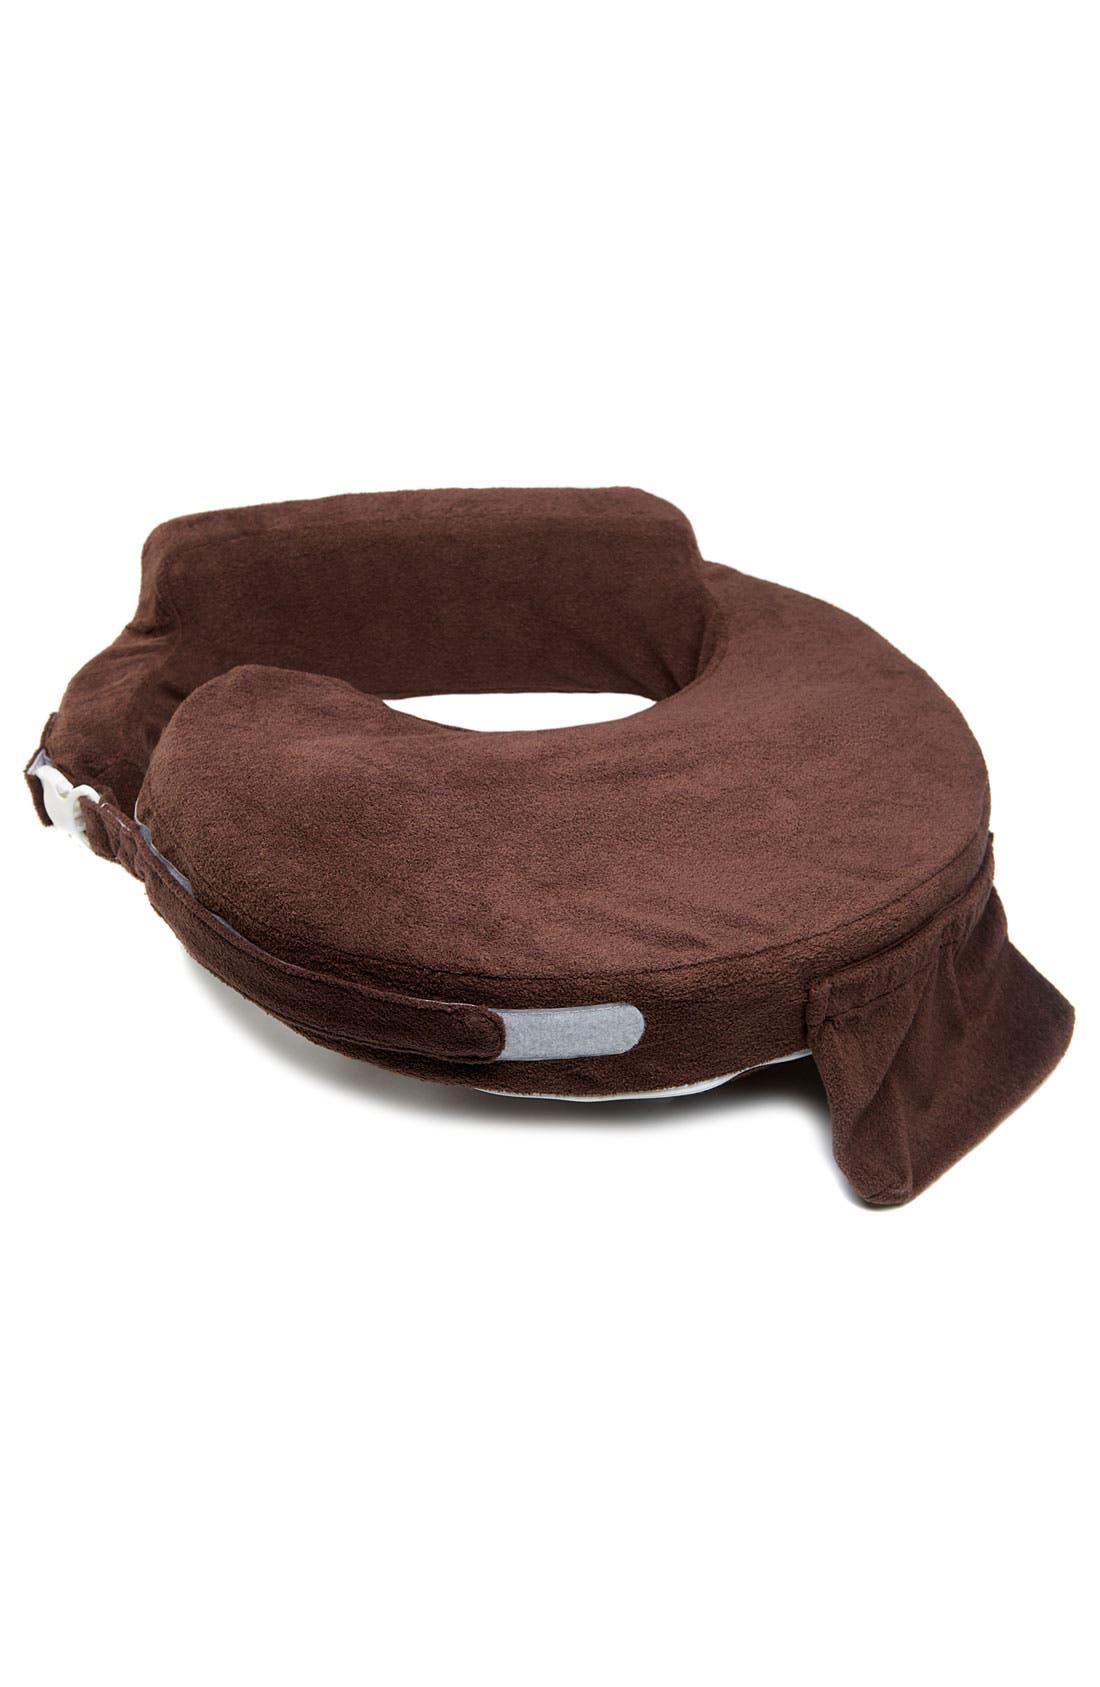 Main Image - My Brest Friend Nursing Pillow